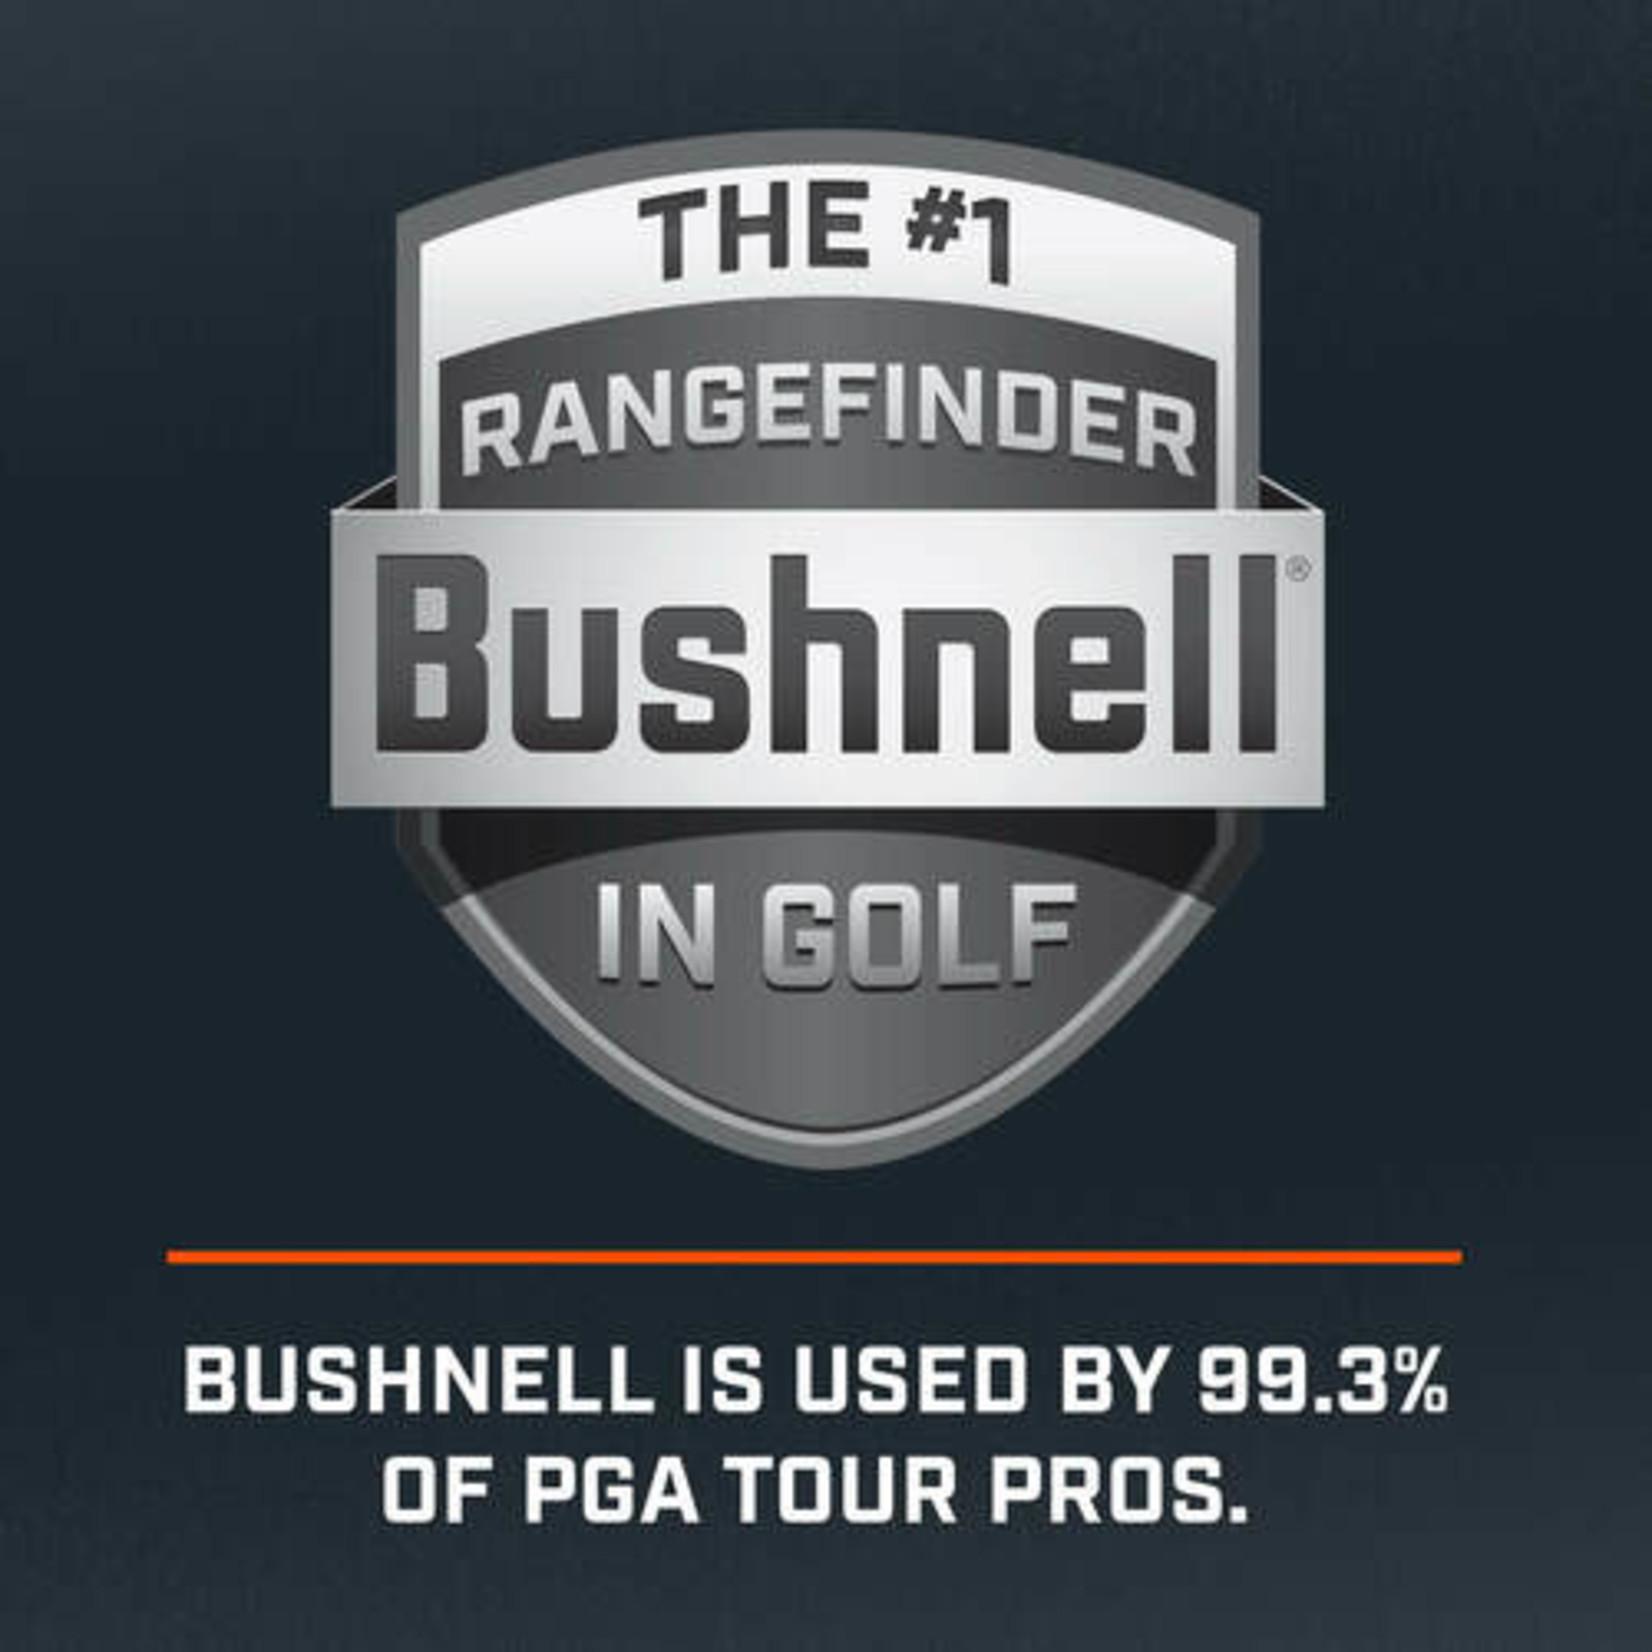 Bushnell Hybrid Rangefinder